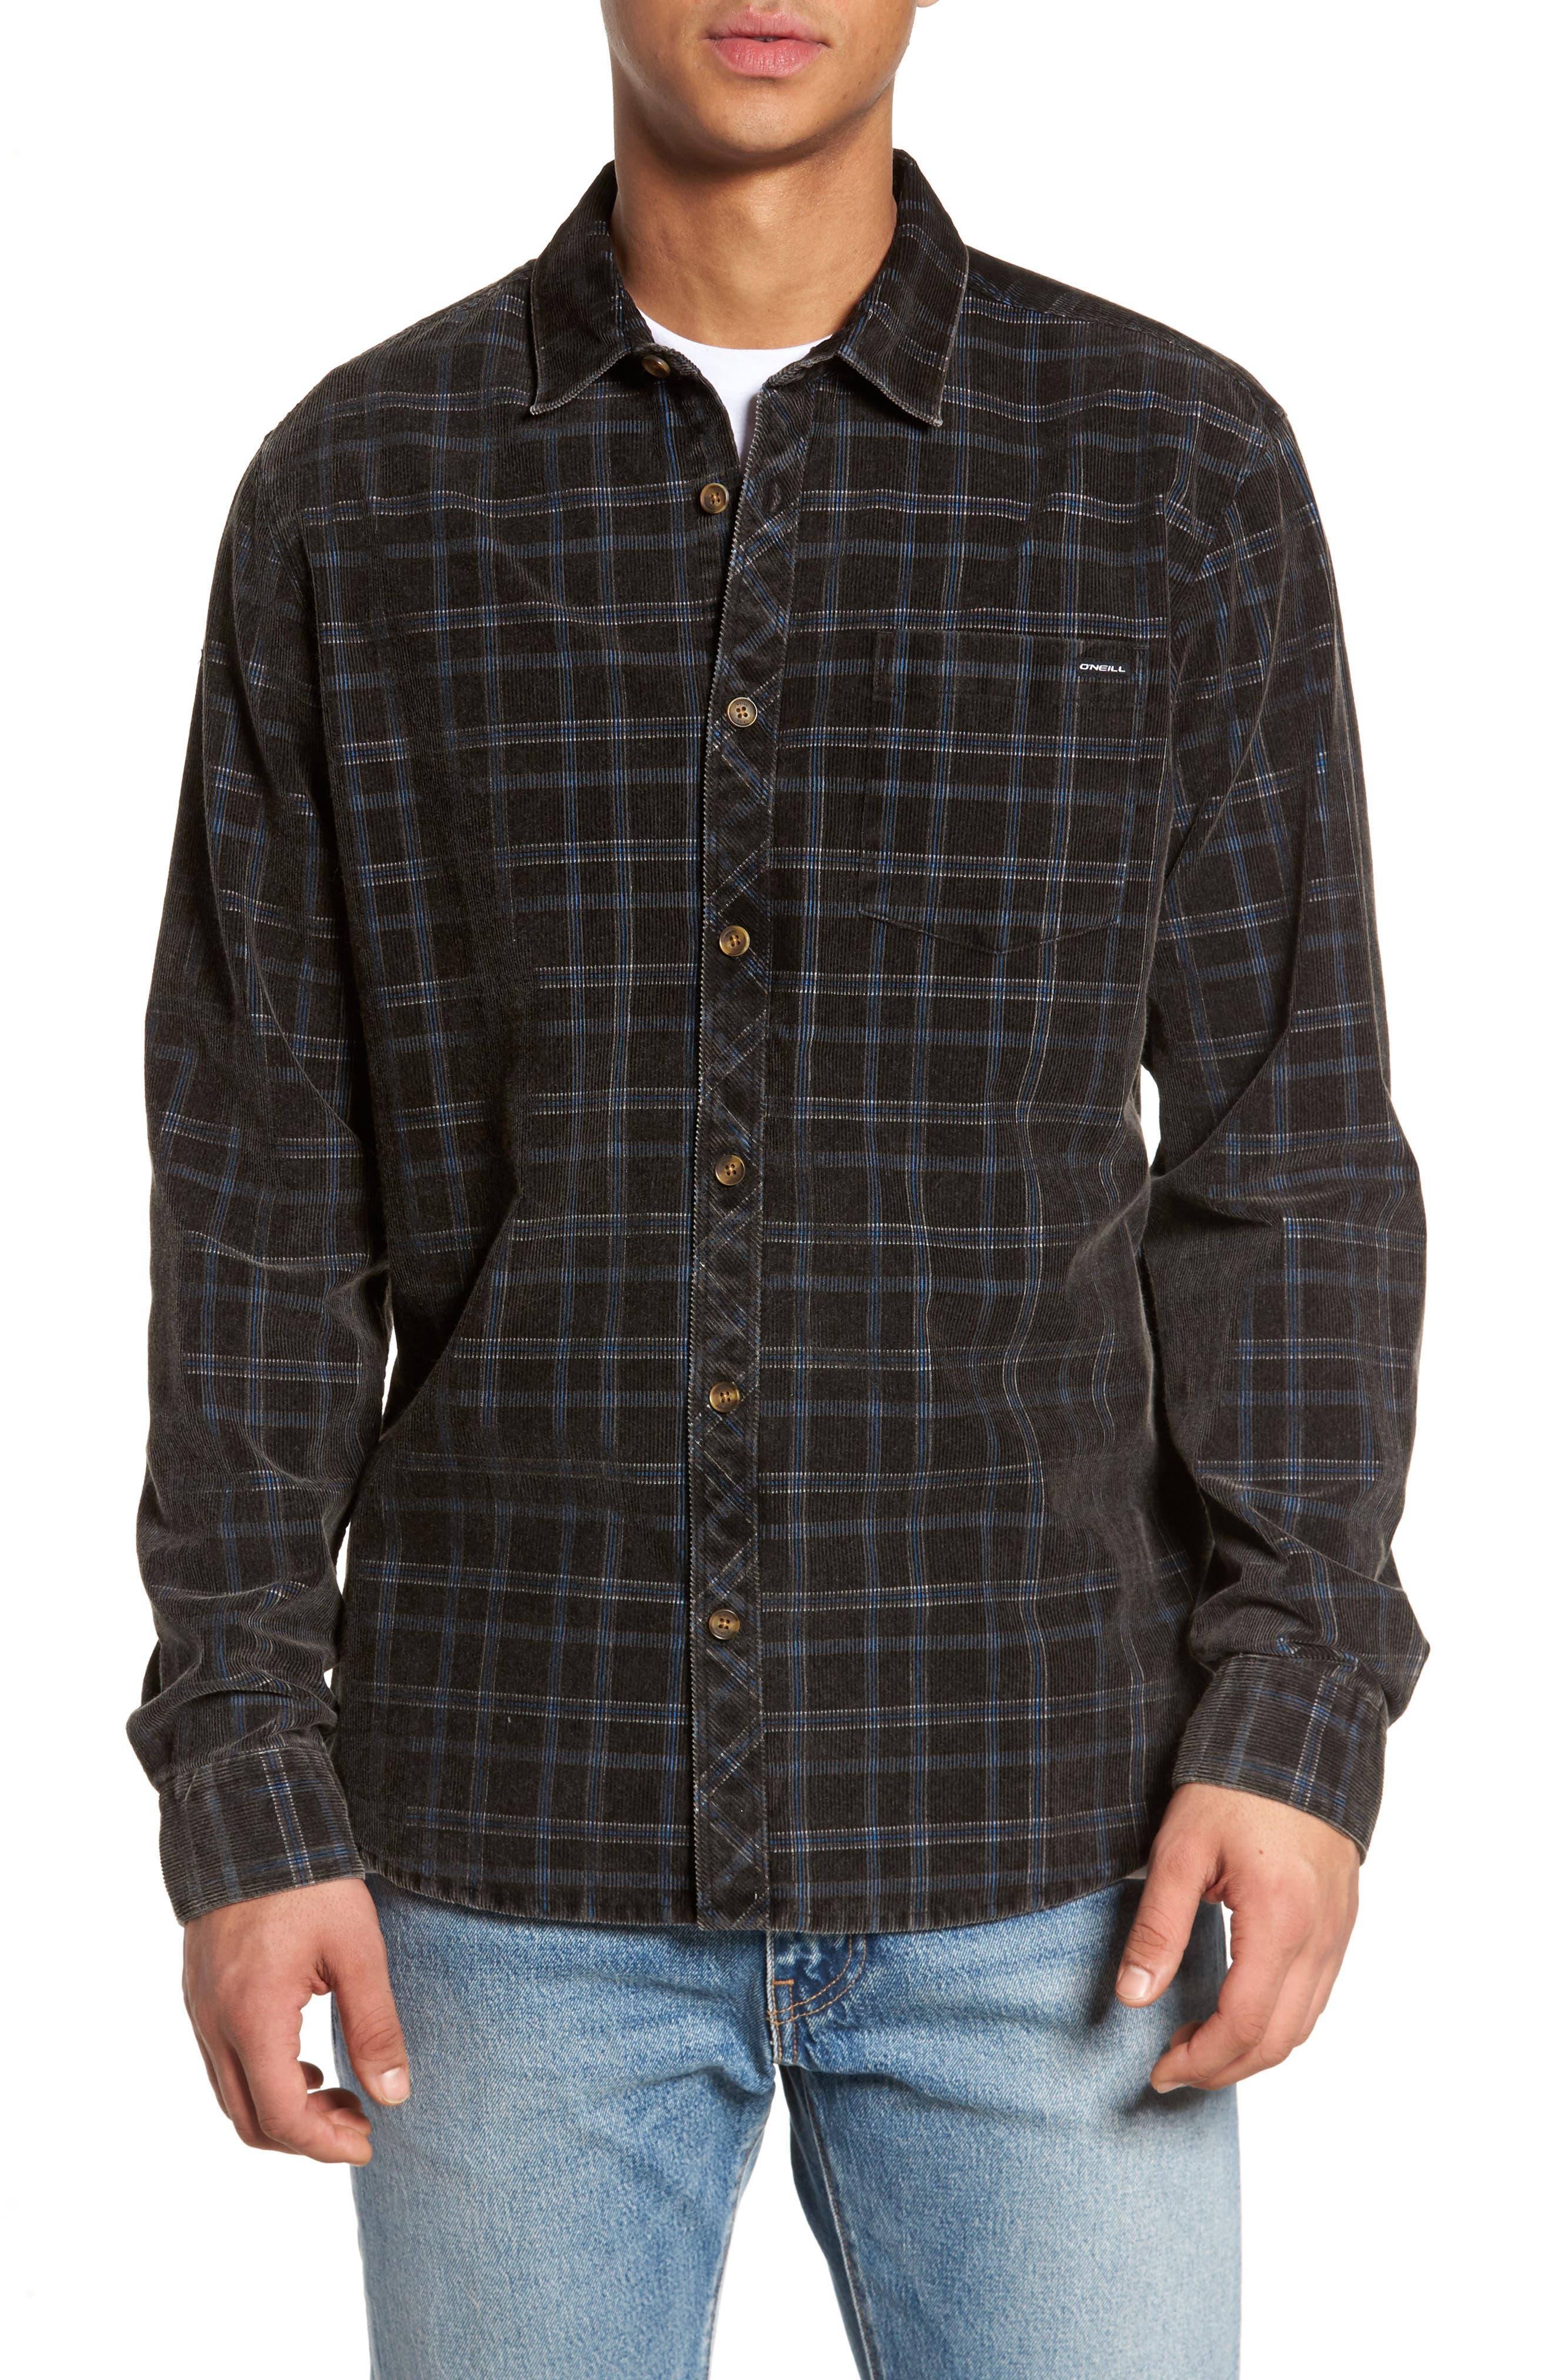 Bradley Corduroy Shirt,                         Main,                         color, 001